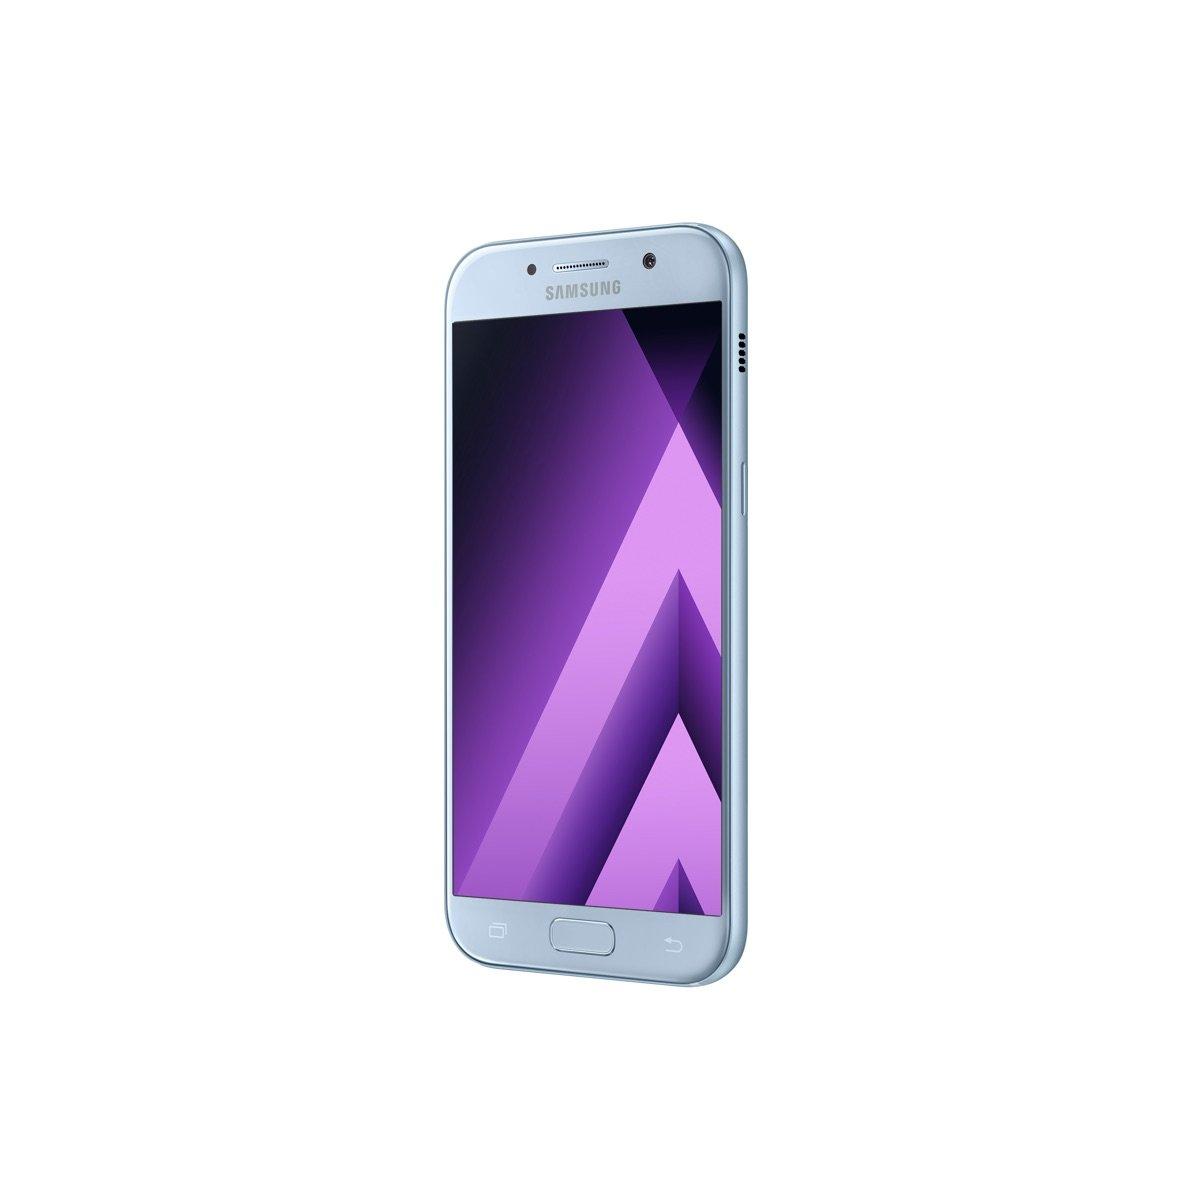 Promo Cell Phones Smartphones Samsung Galaxy A5 Gold 32gb Epicdeal Balmer B7889m Ss Jam Tangan Pria Silver Hitam A7 2017 Factory Unlocked Sm A720f